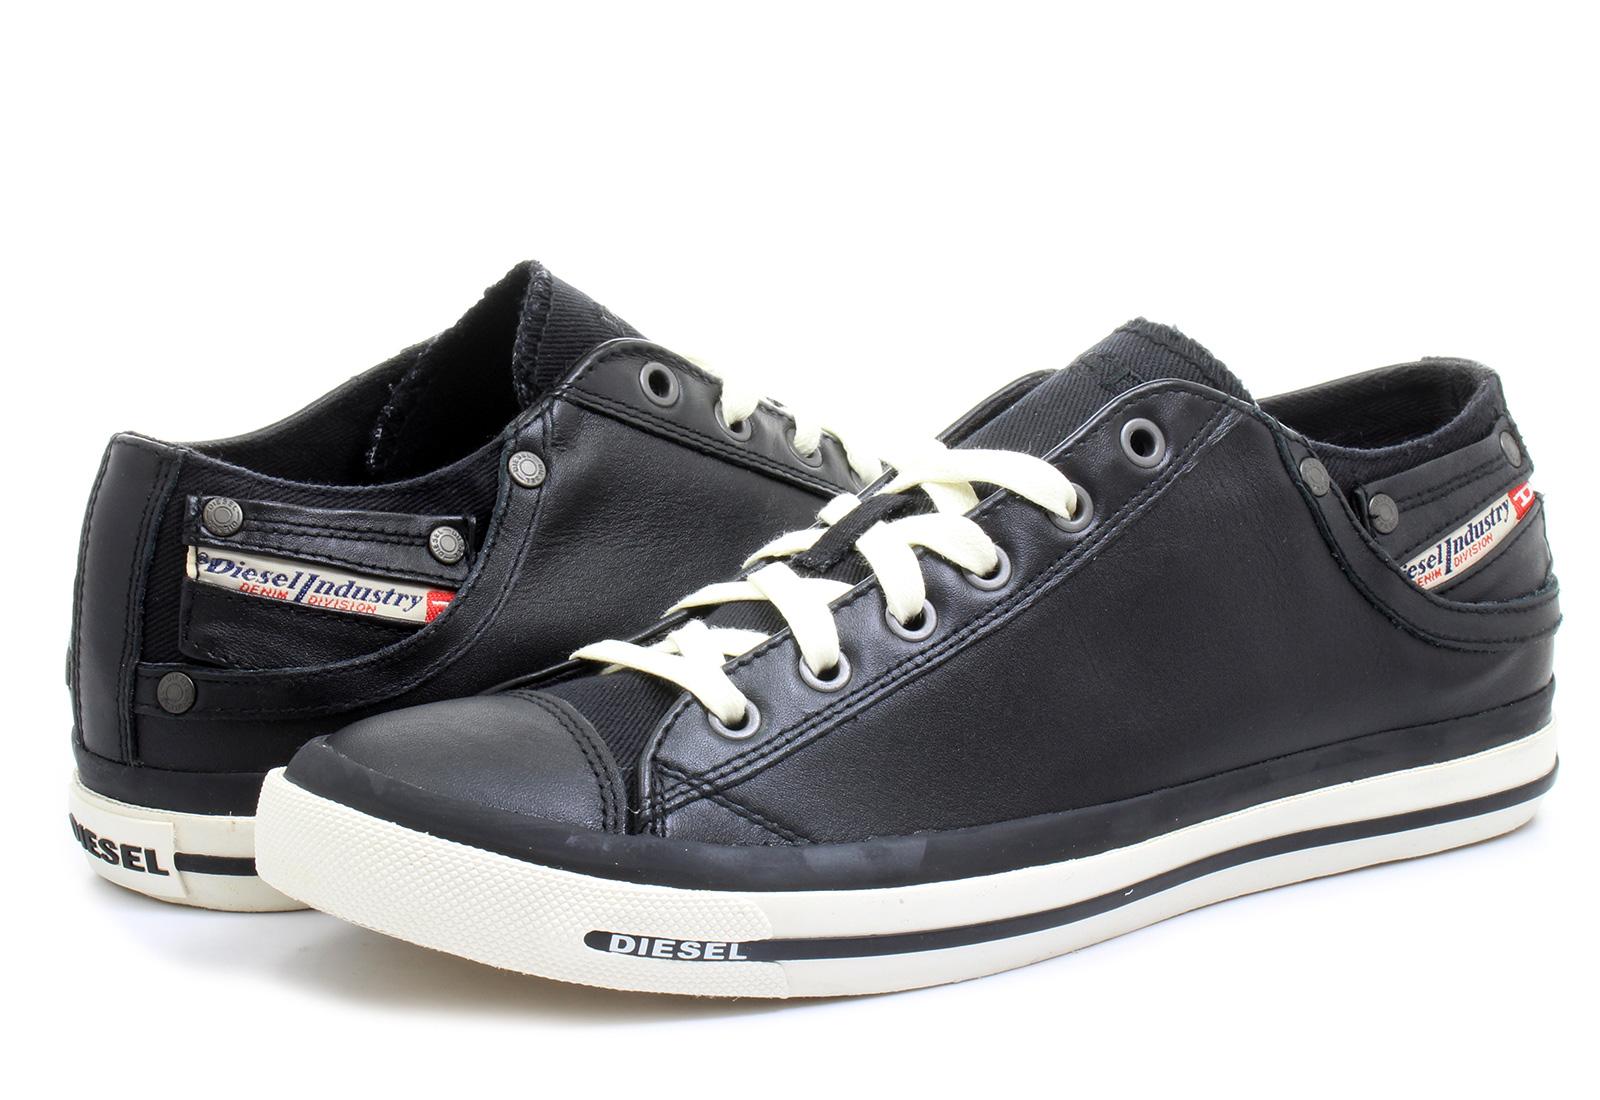 Diesel Cipő - Exposure Low I - 321-052-8013 - Office Shoes Magyarország 9ff0a0b8b9